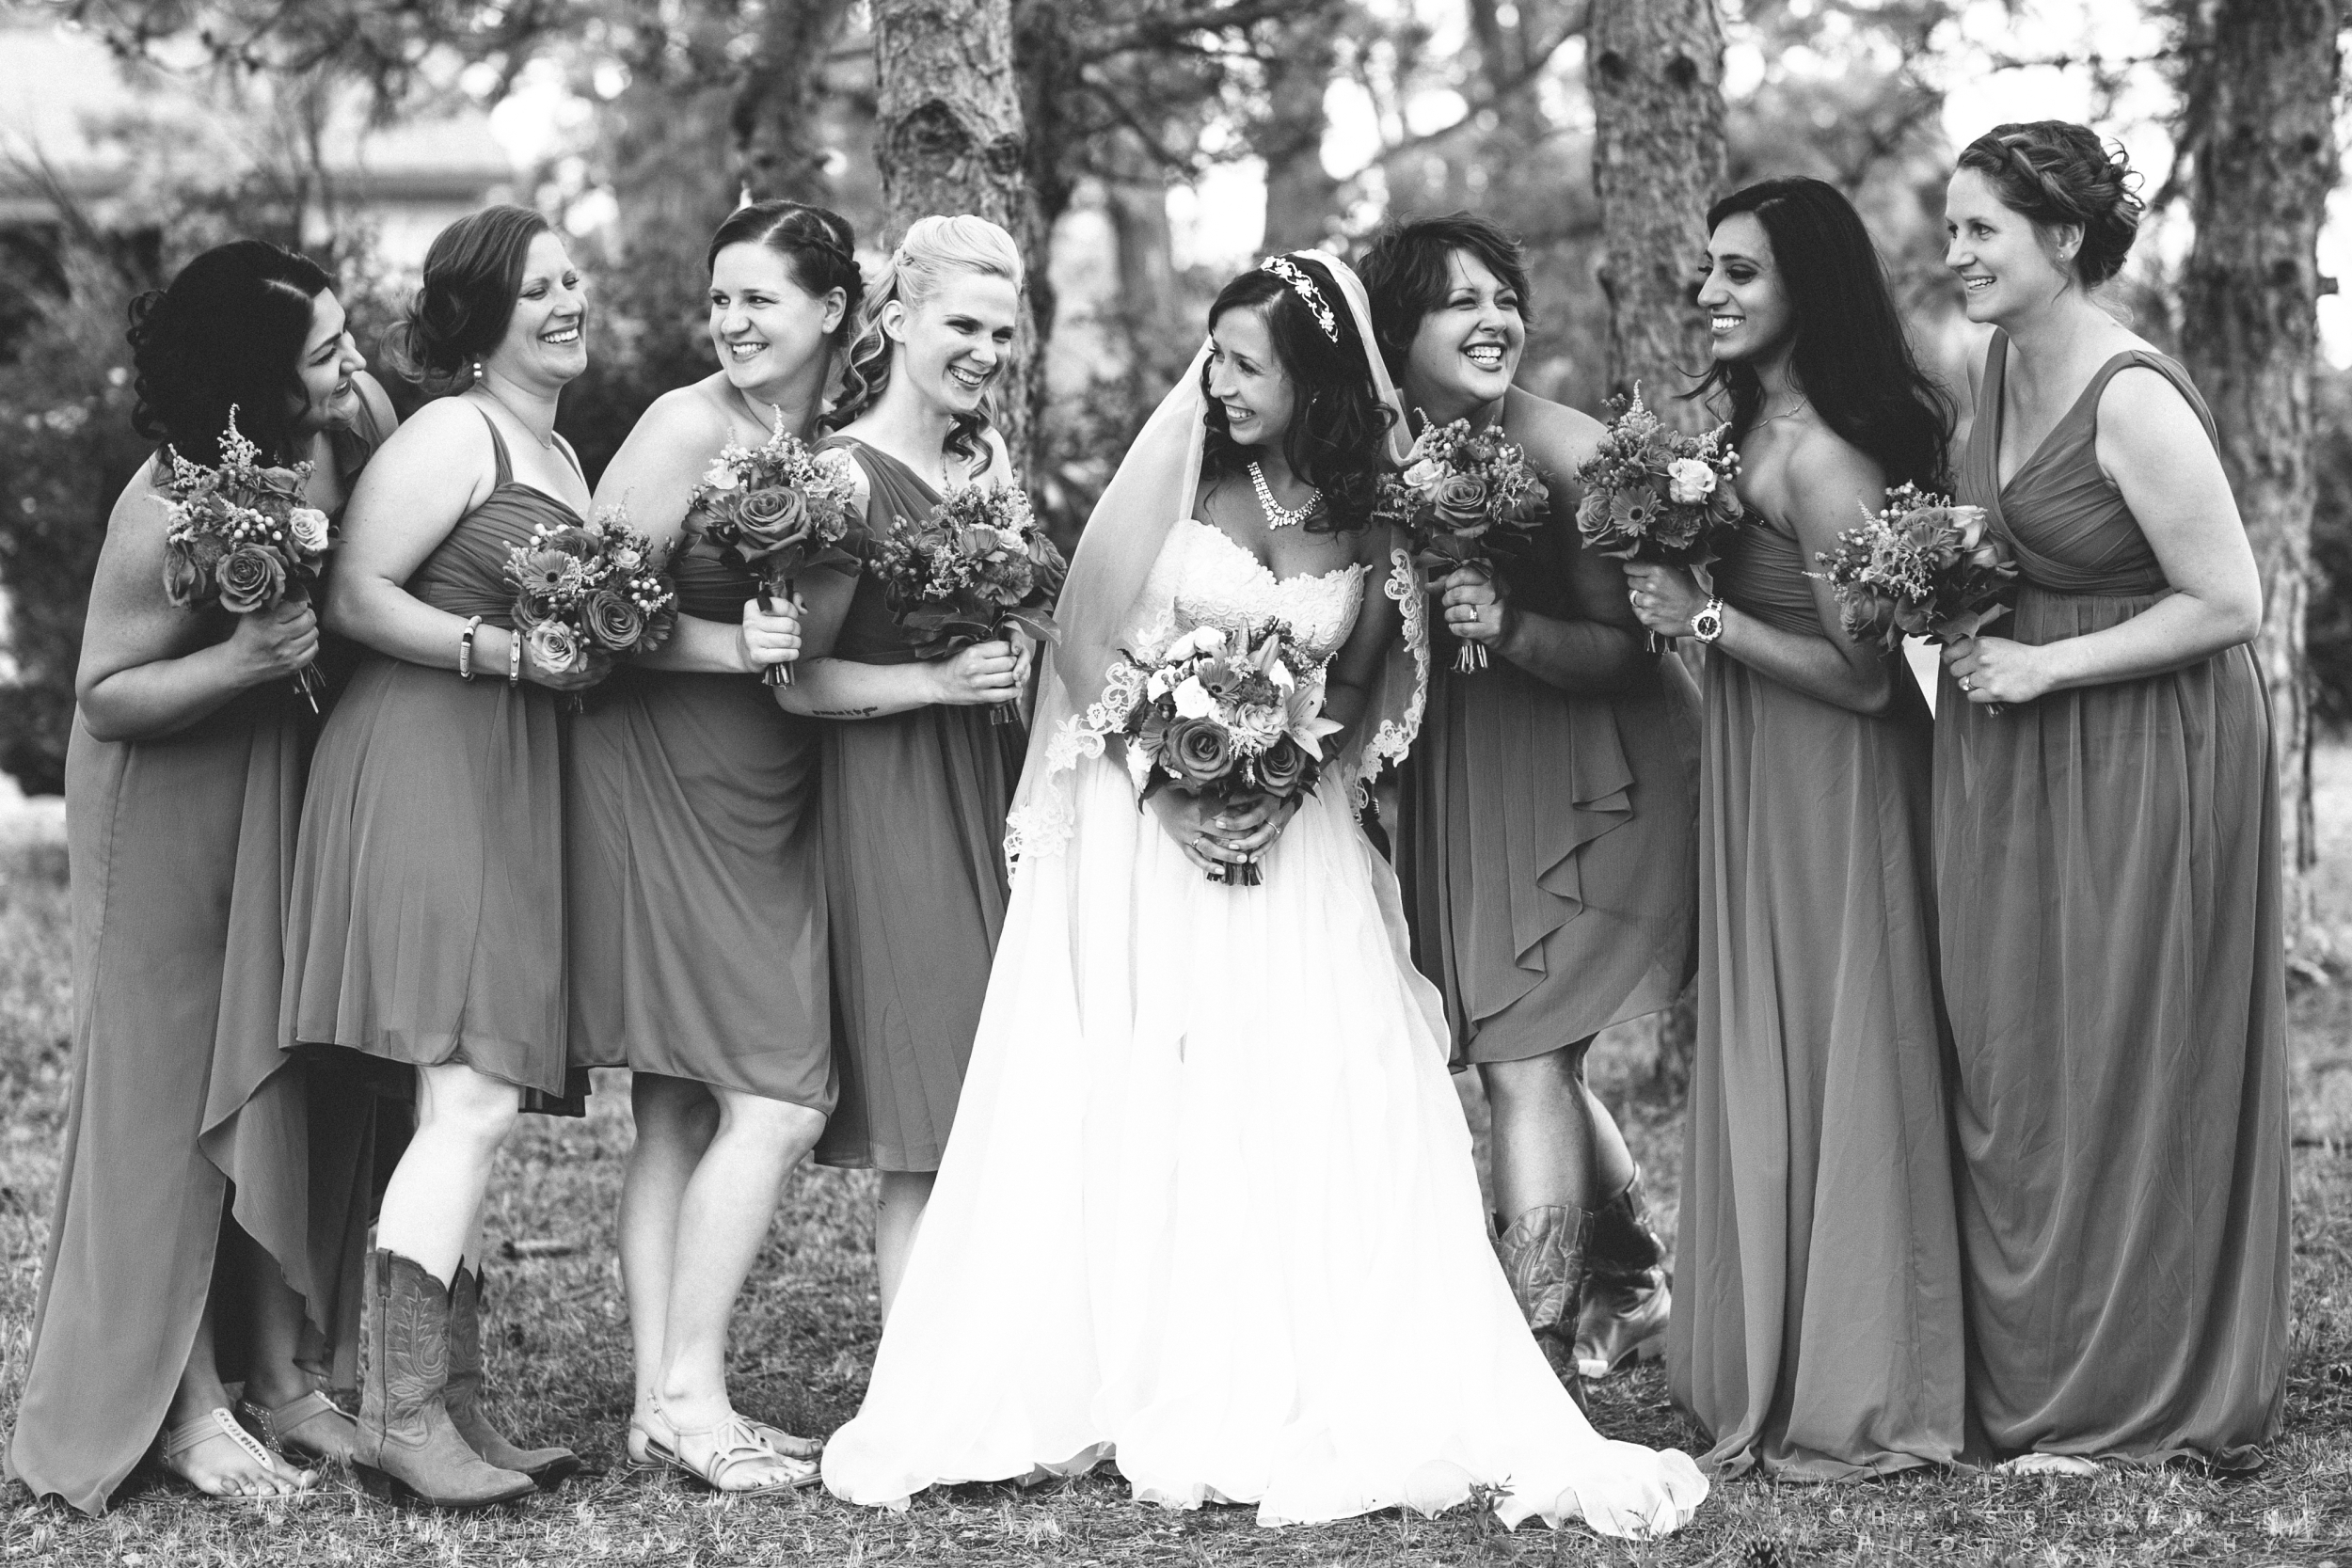 crete_IL_farm_wedding_photographer_0012.jpg